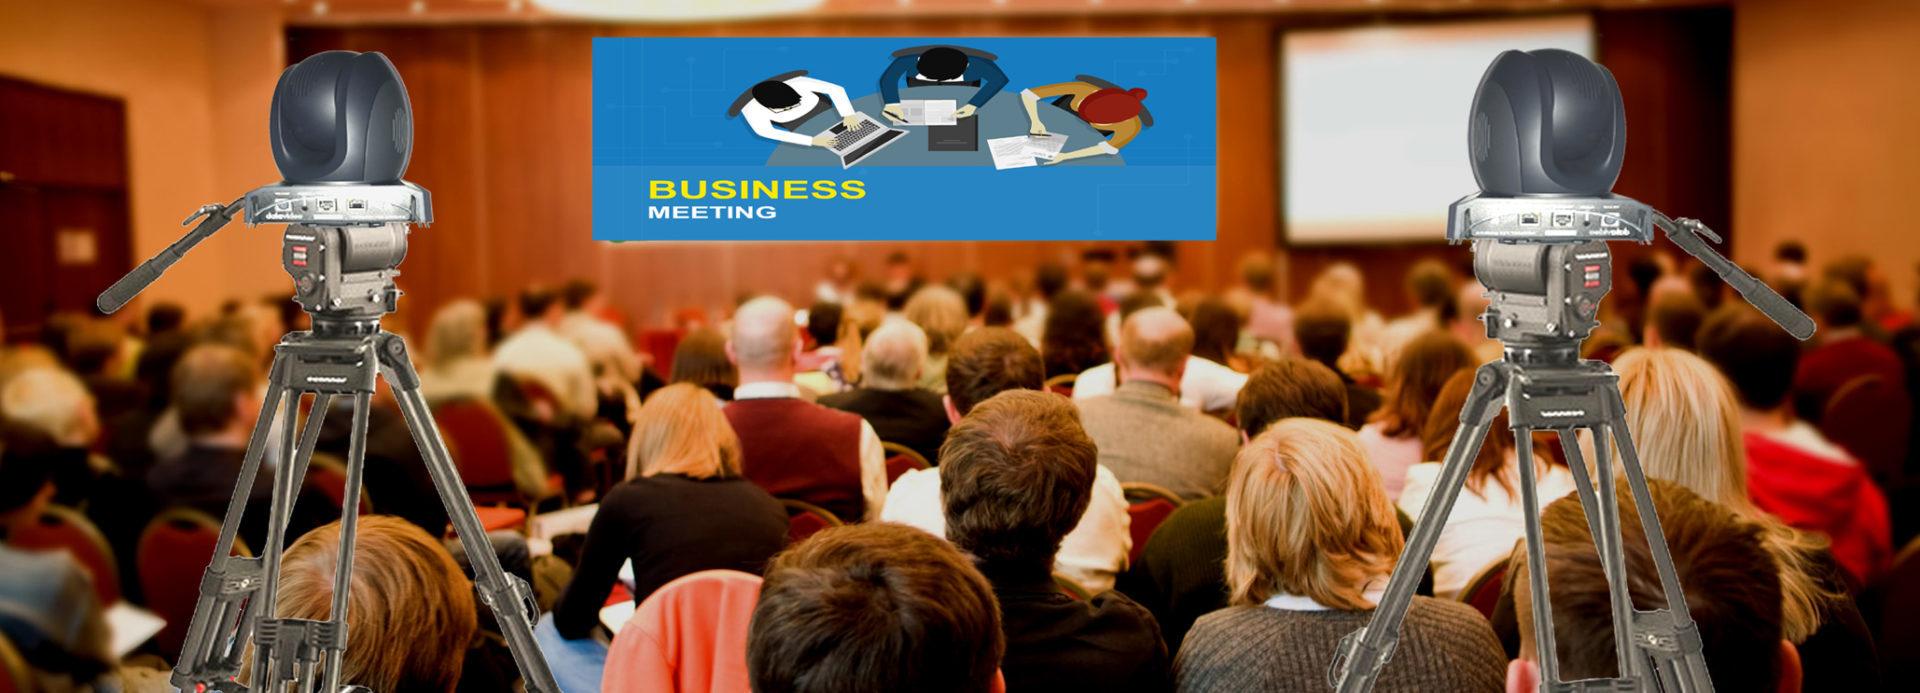 Live stream meetings education training los anglees